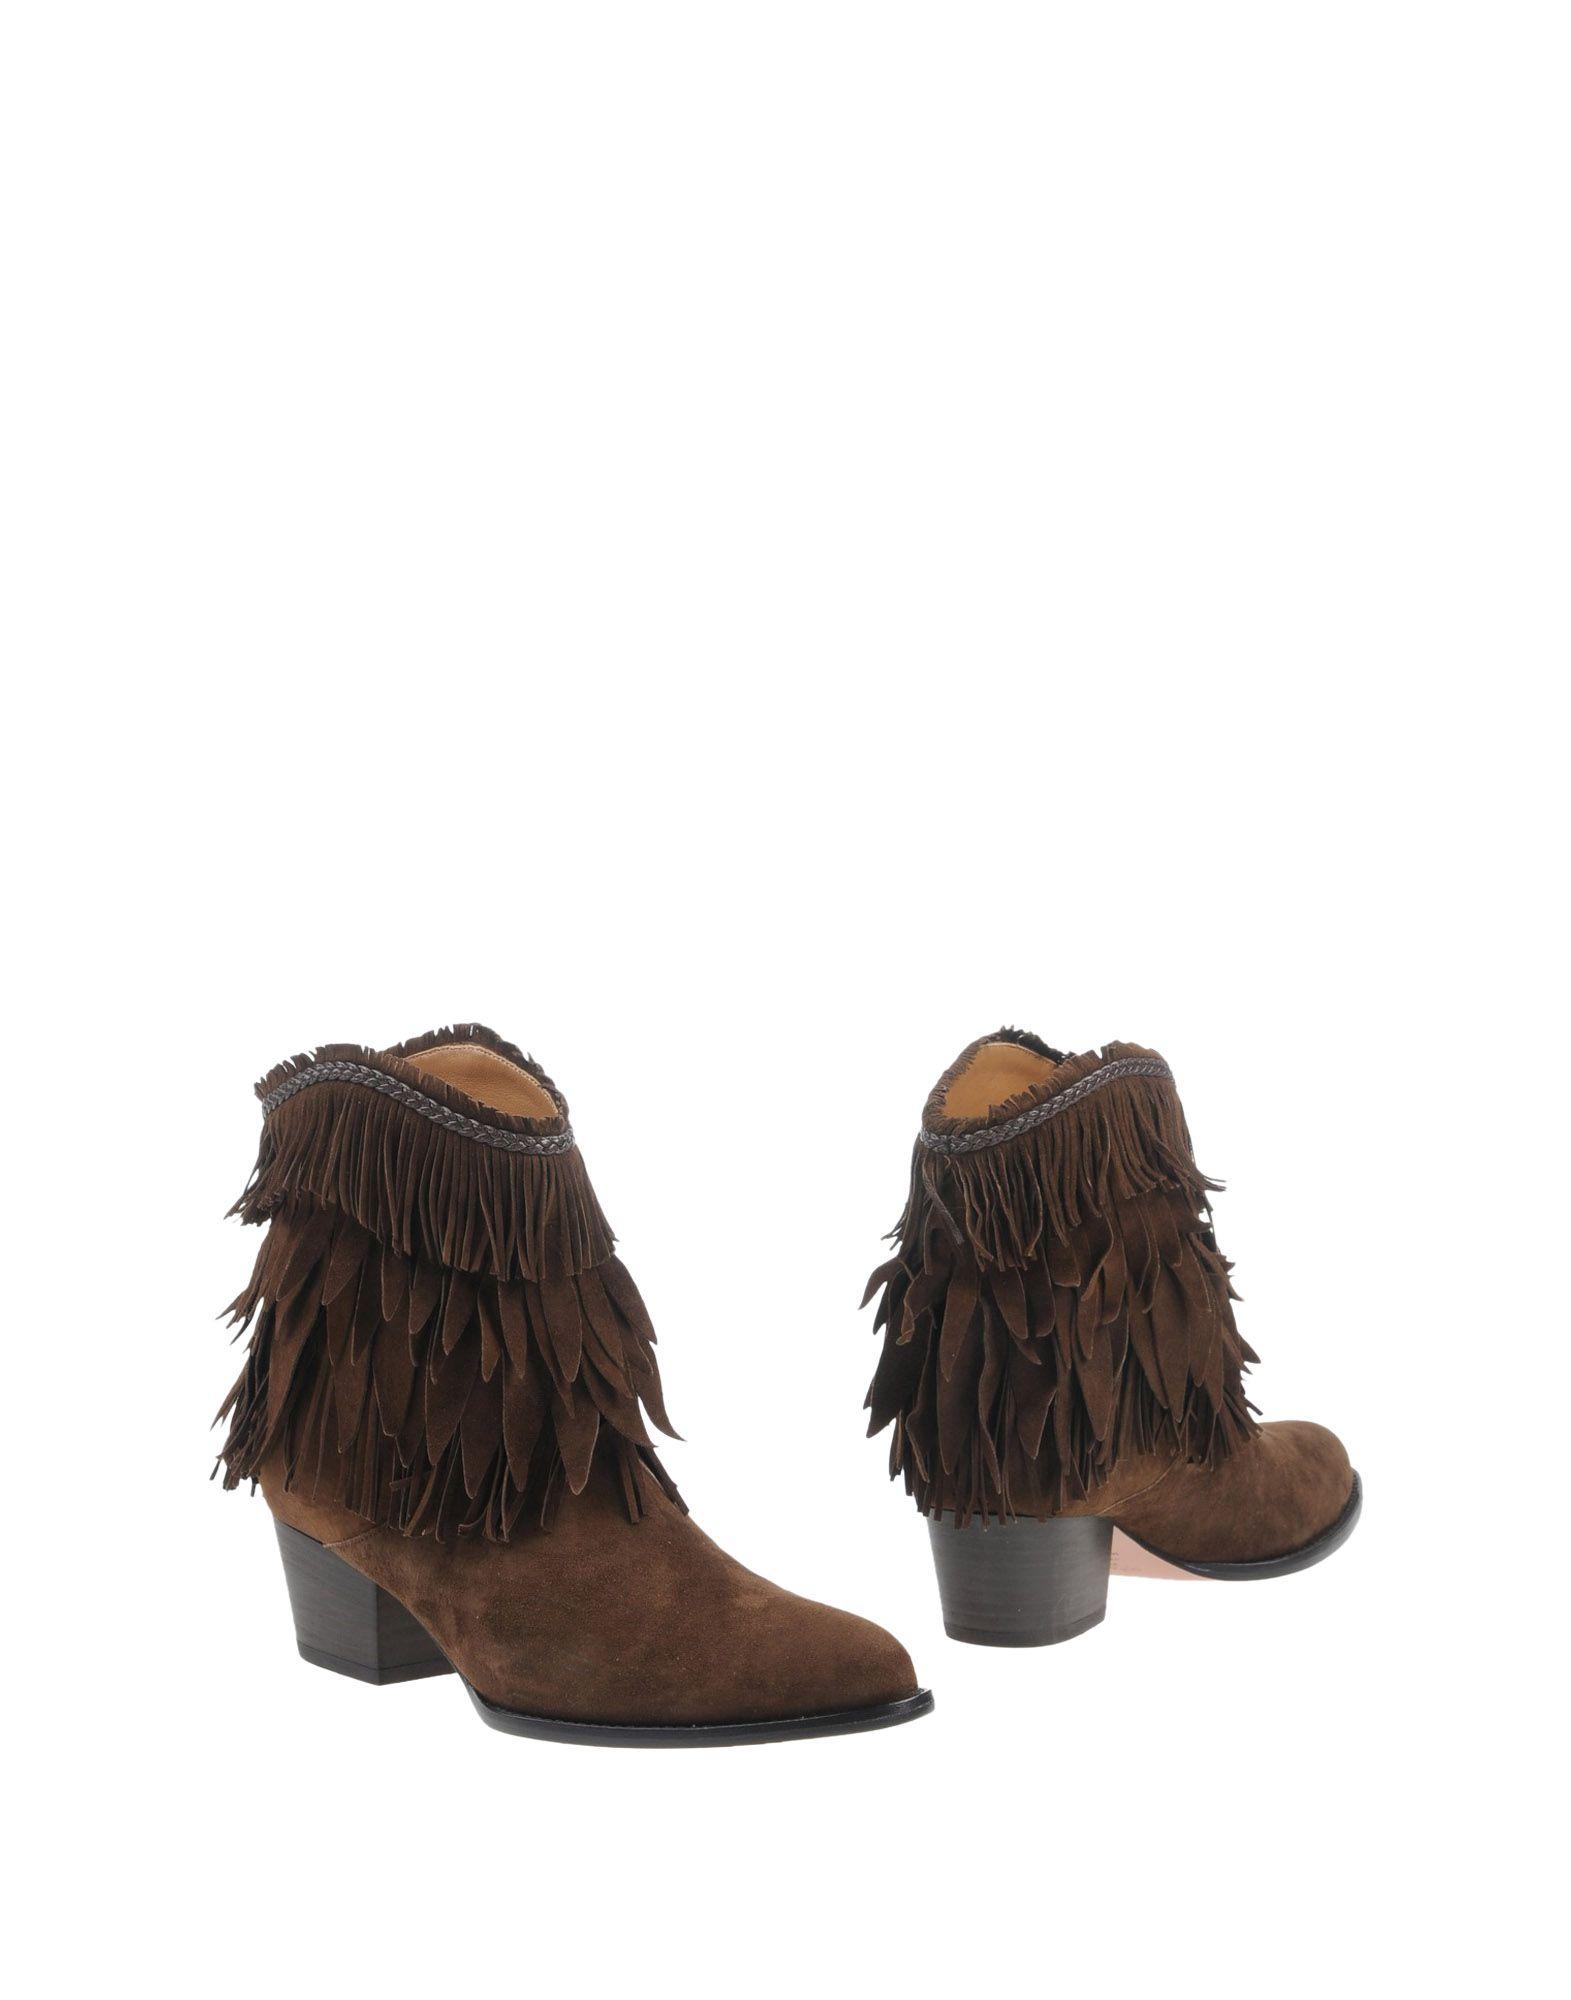 Aquazzura Stiefelette aussehende Damen  11232079HSGünstige gut aussehende Stiefelette Schuhe e183a2